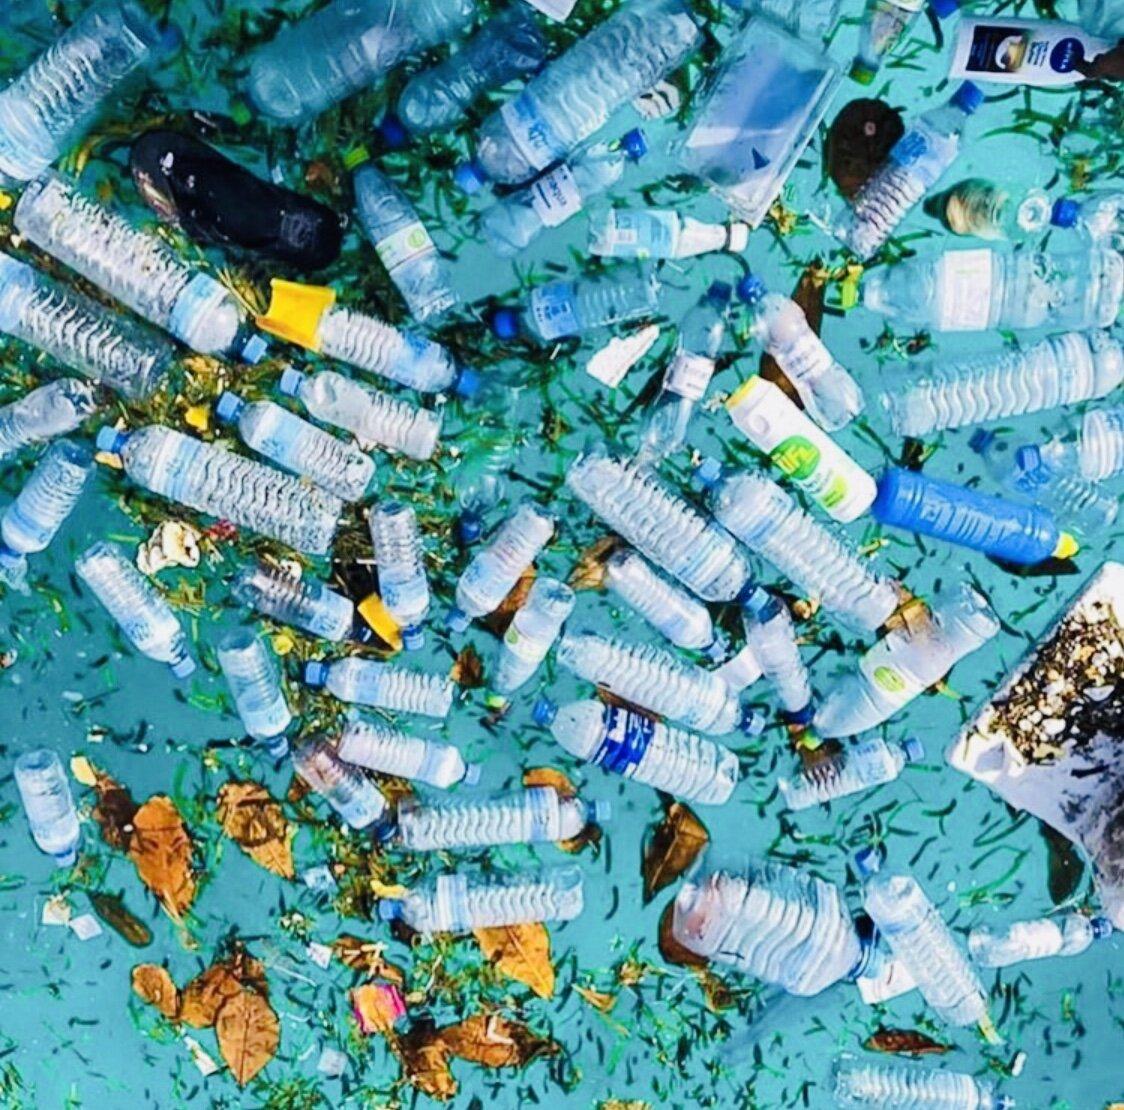 SINGLE USE PLASTICS - Every single piece of plastic made still exists today